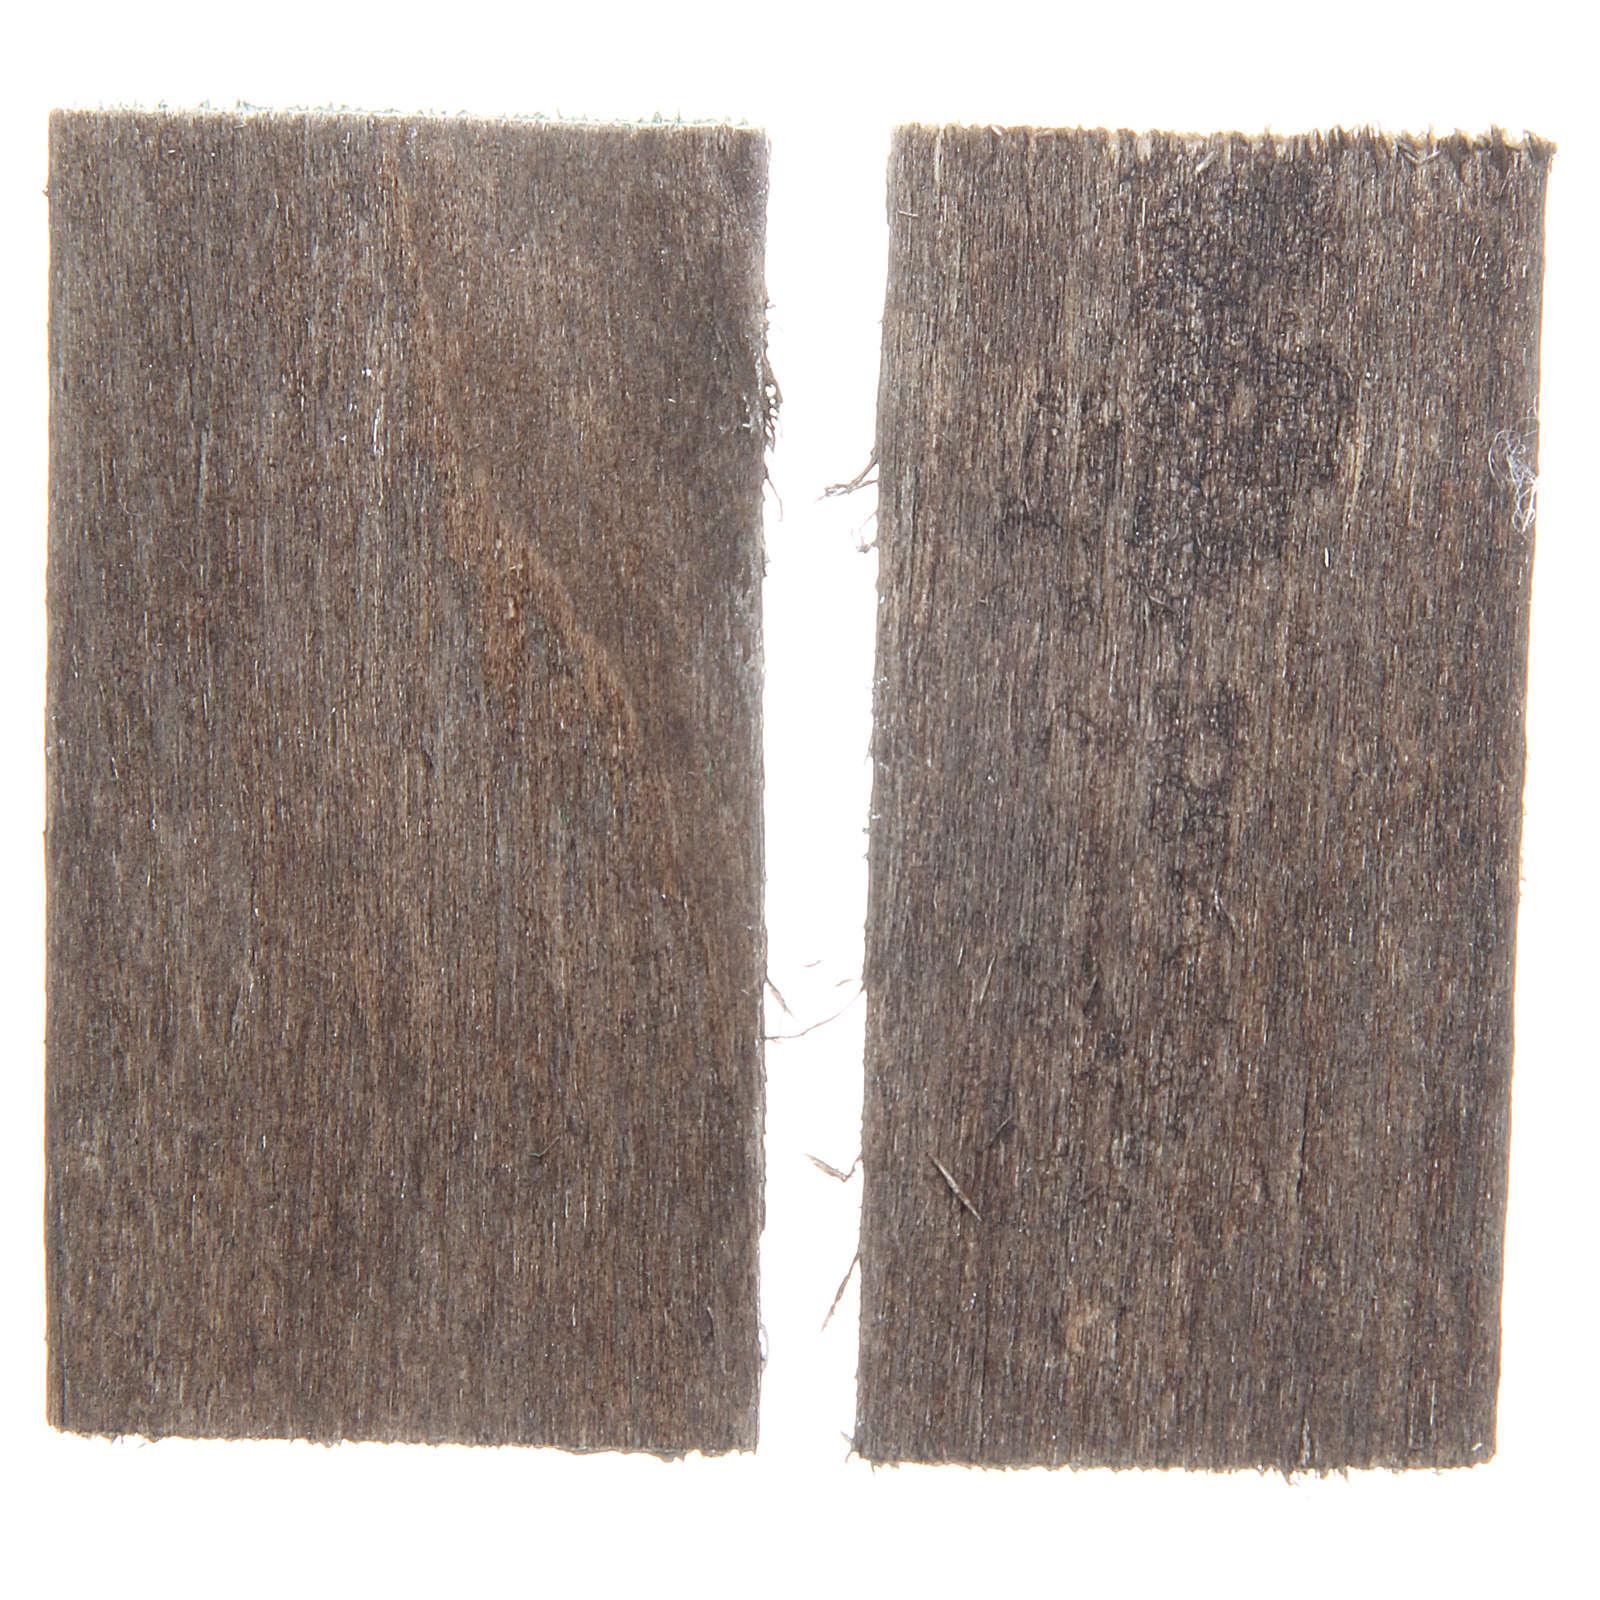 Ventana de madera cm 5,5x3 rectangular set 2 piezas 4